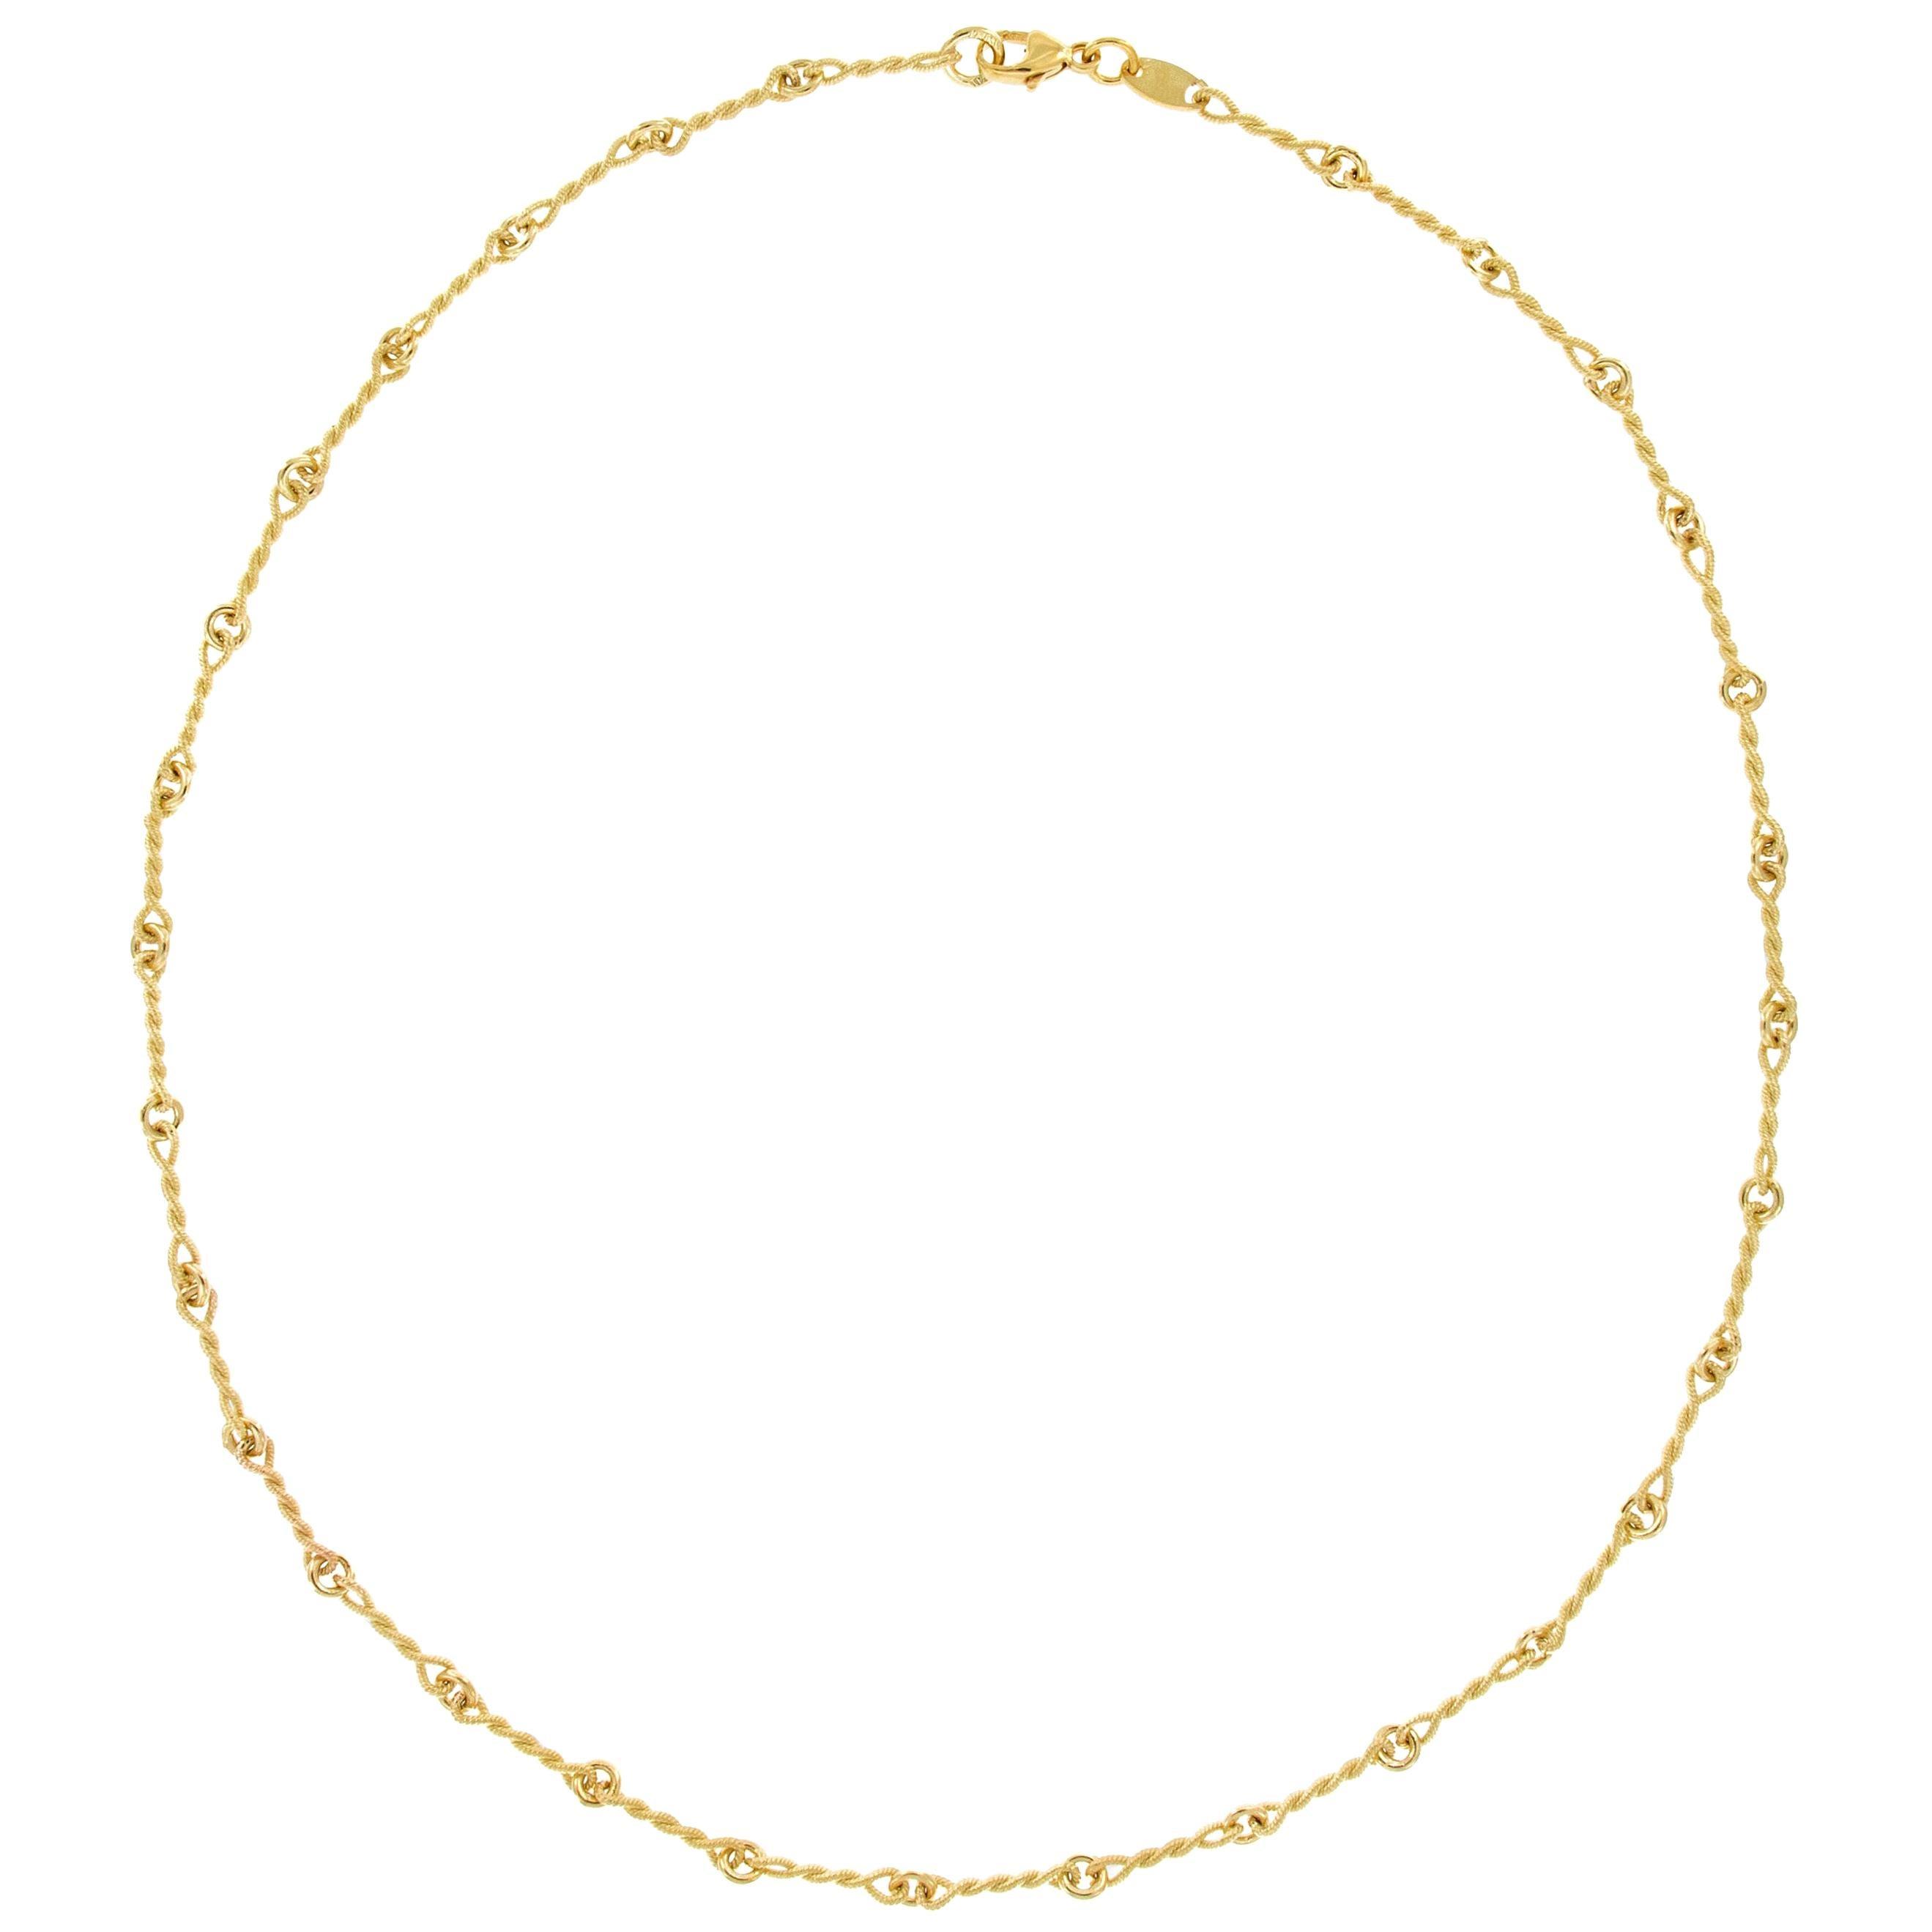 "Italian ""Handmade"" 18 Karat Yellow Gold Chain Link Necklace"